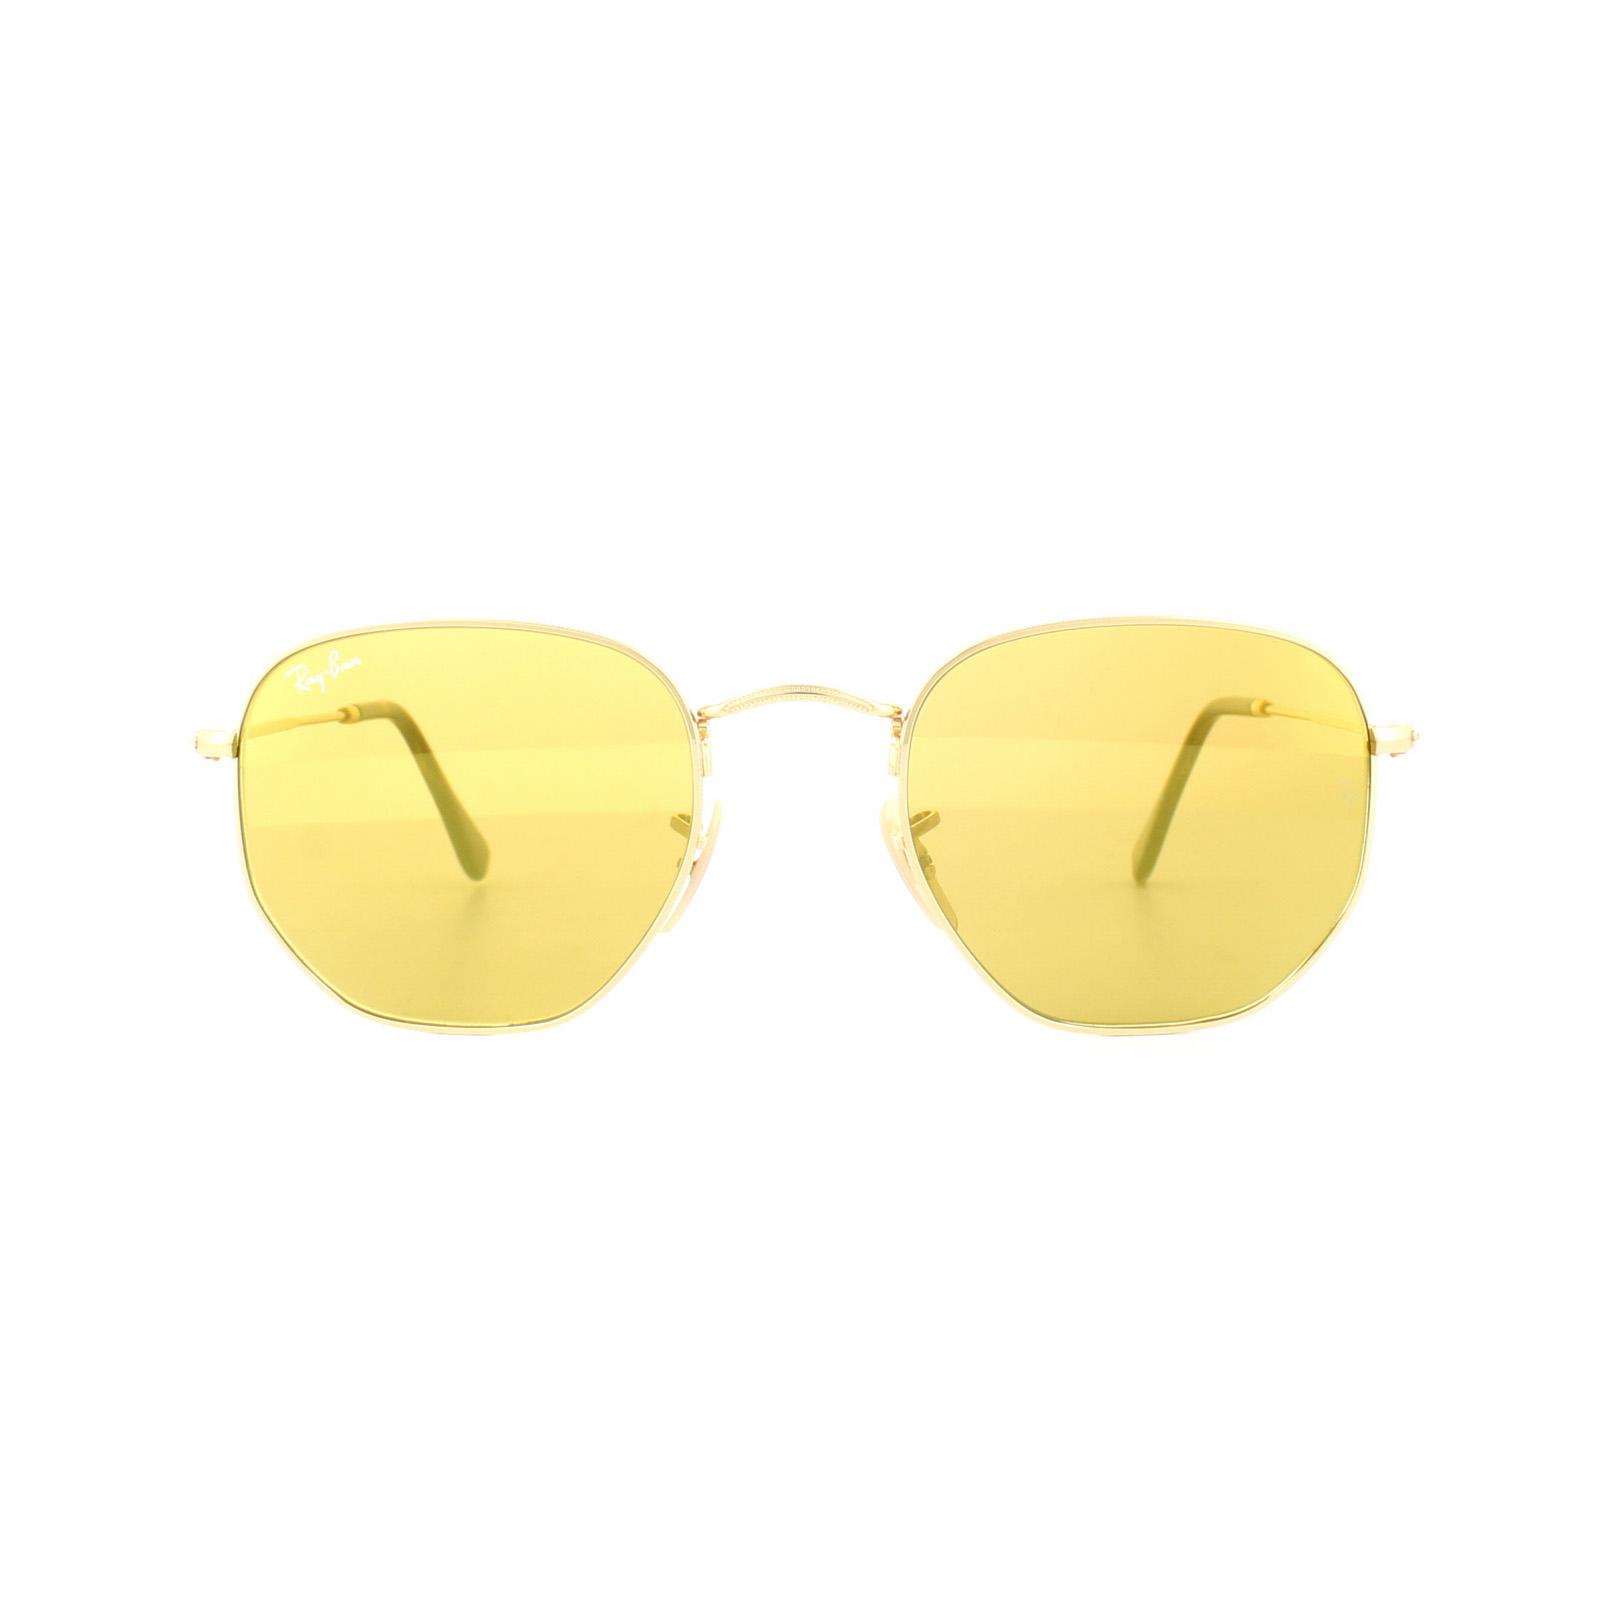 f209bf34c7 Sentinel Ray-Ban Sunglasses Hexagonal 3548N 001 93 Gold Yellow Mirror